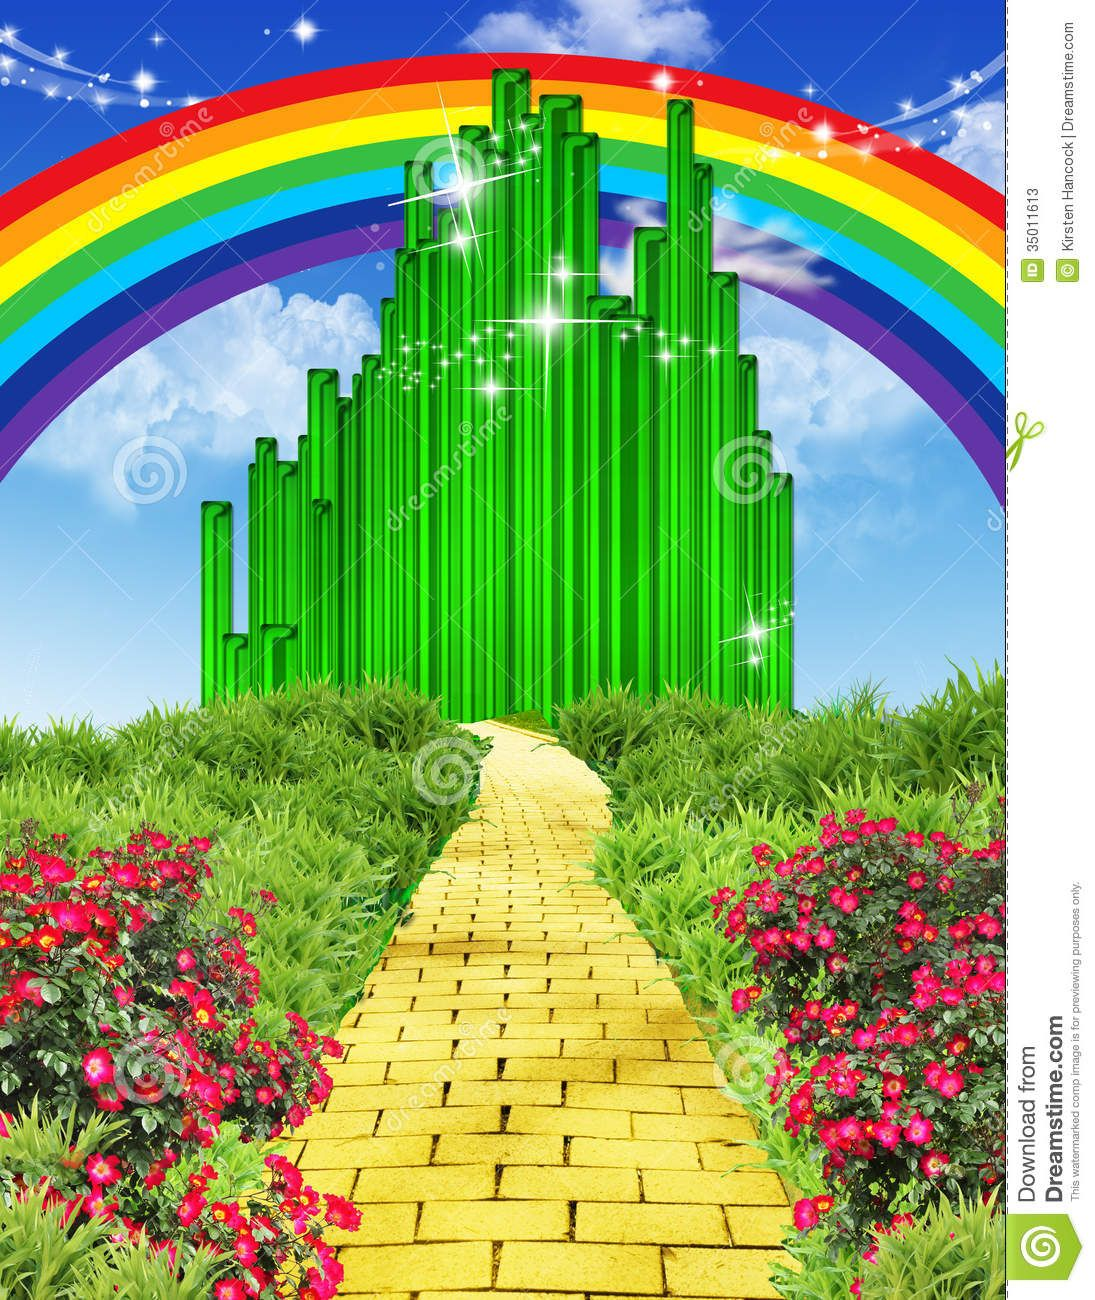 Rainbow Over The Yellow Brick Road Stock Photos